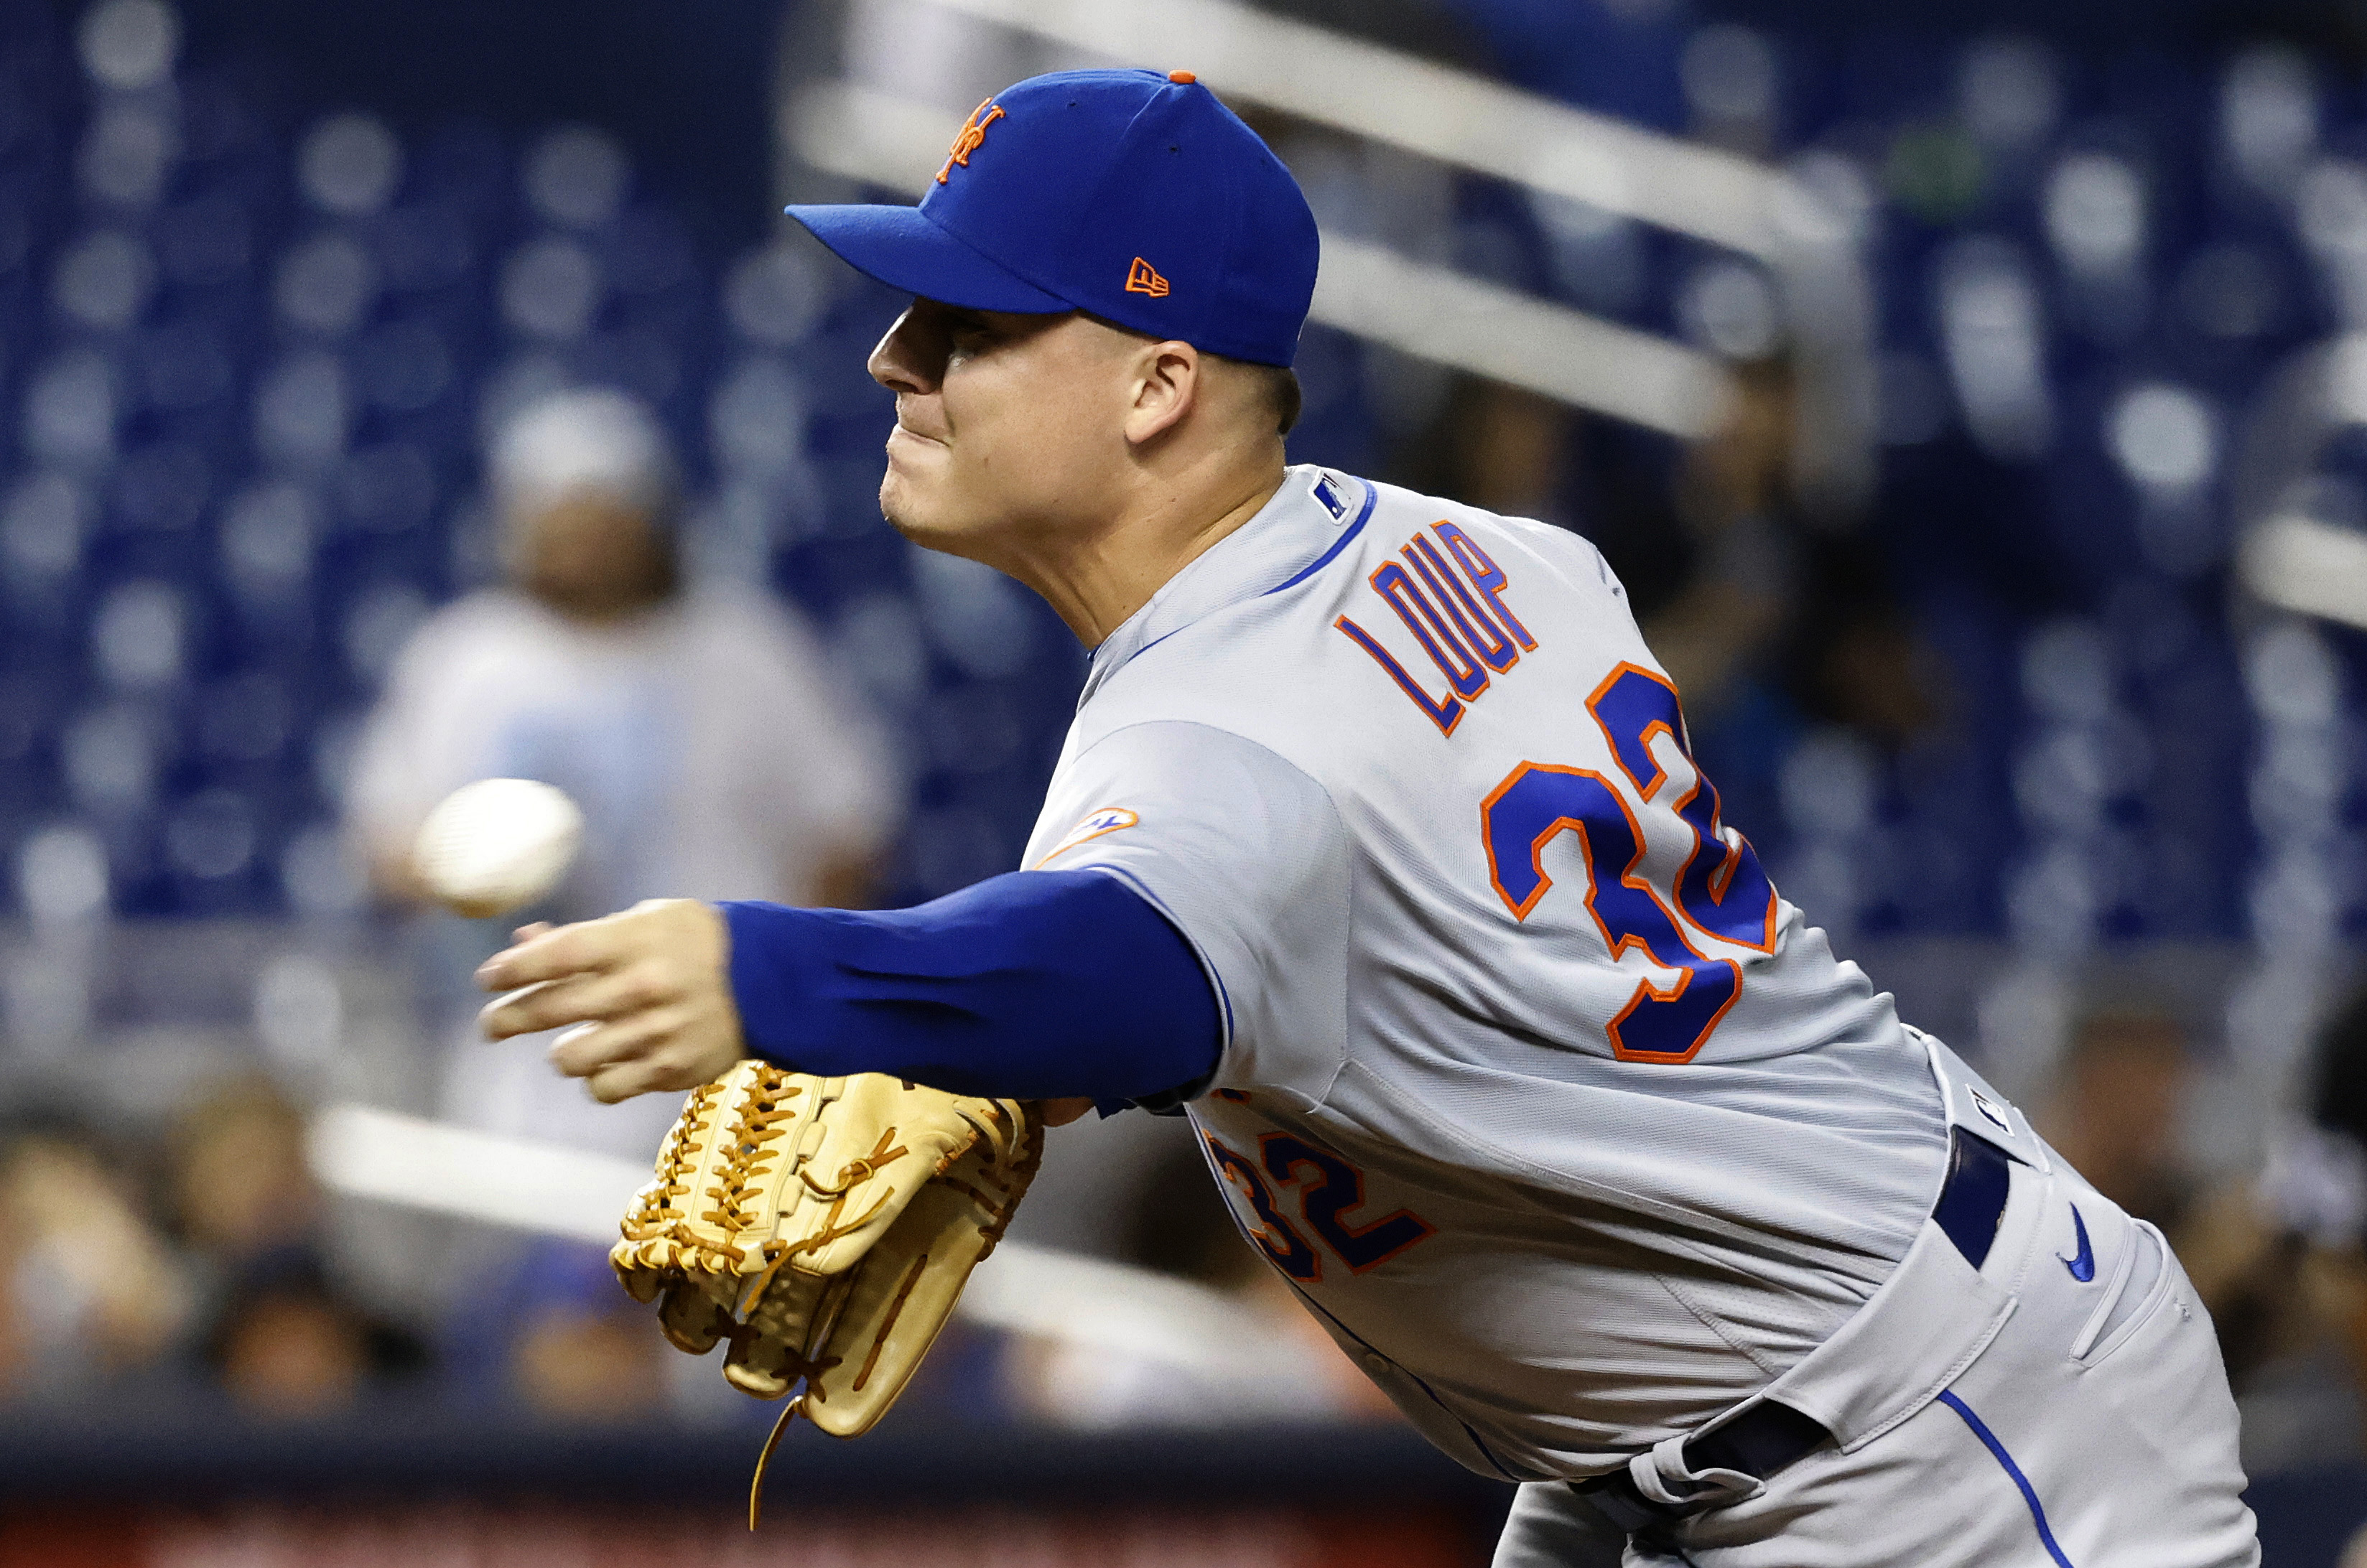 New York Mets 2021 Season in Review: Bullpen